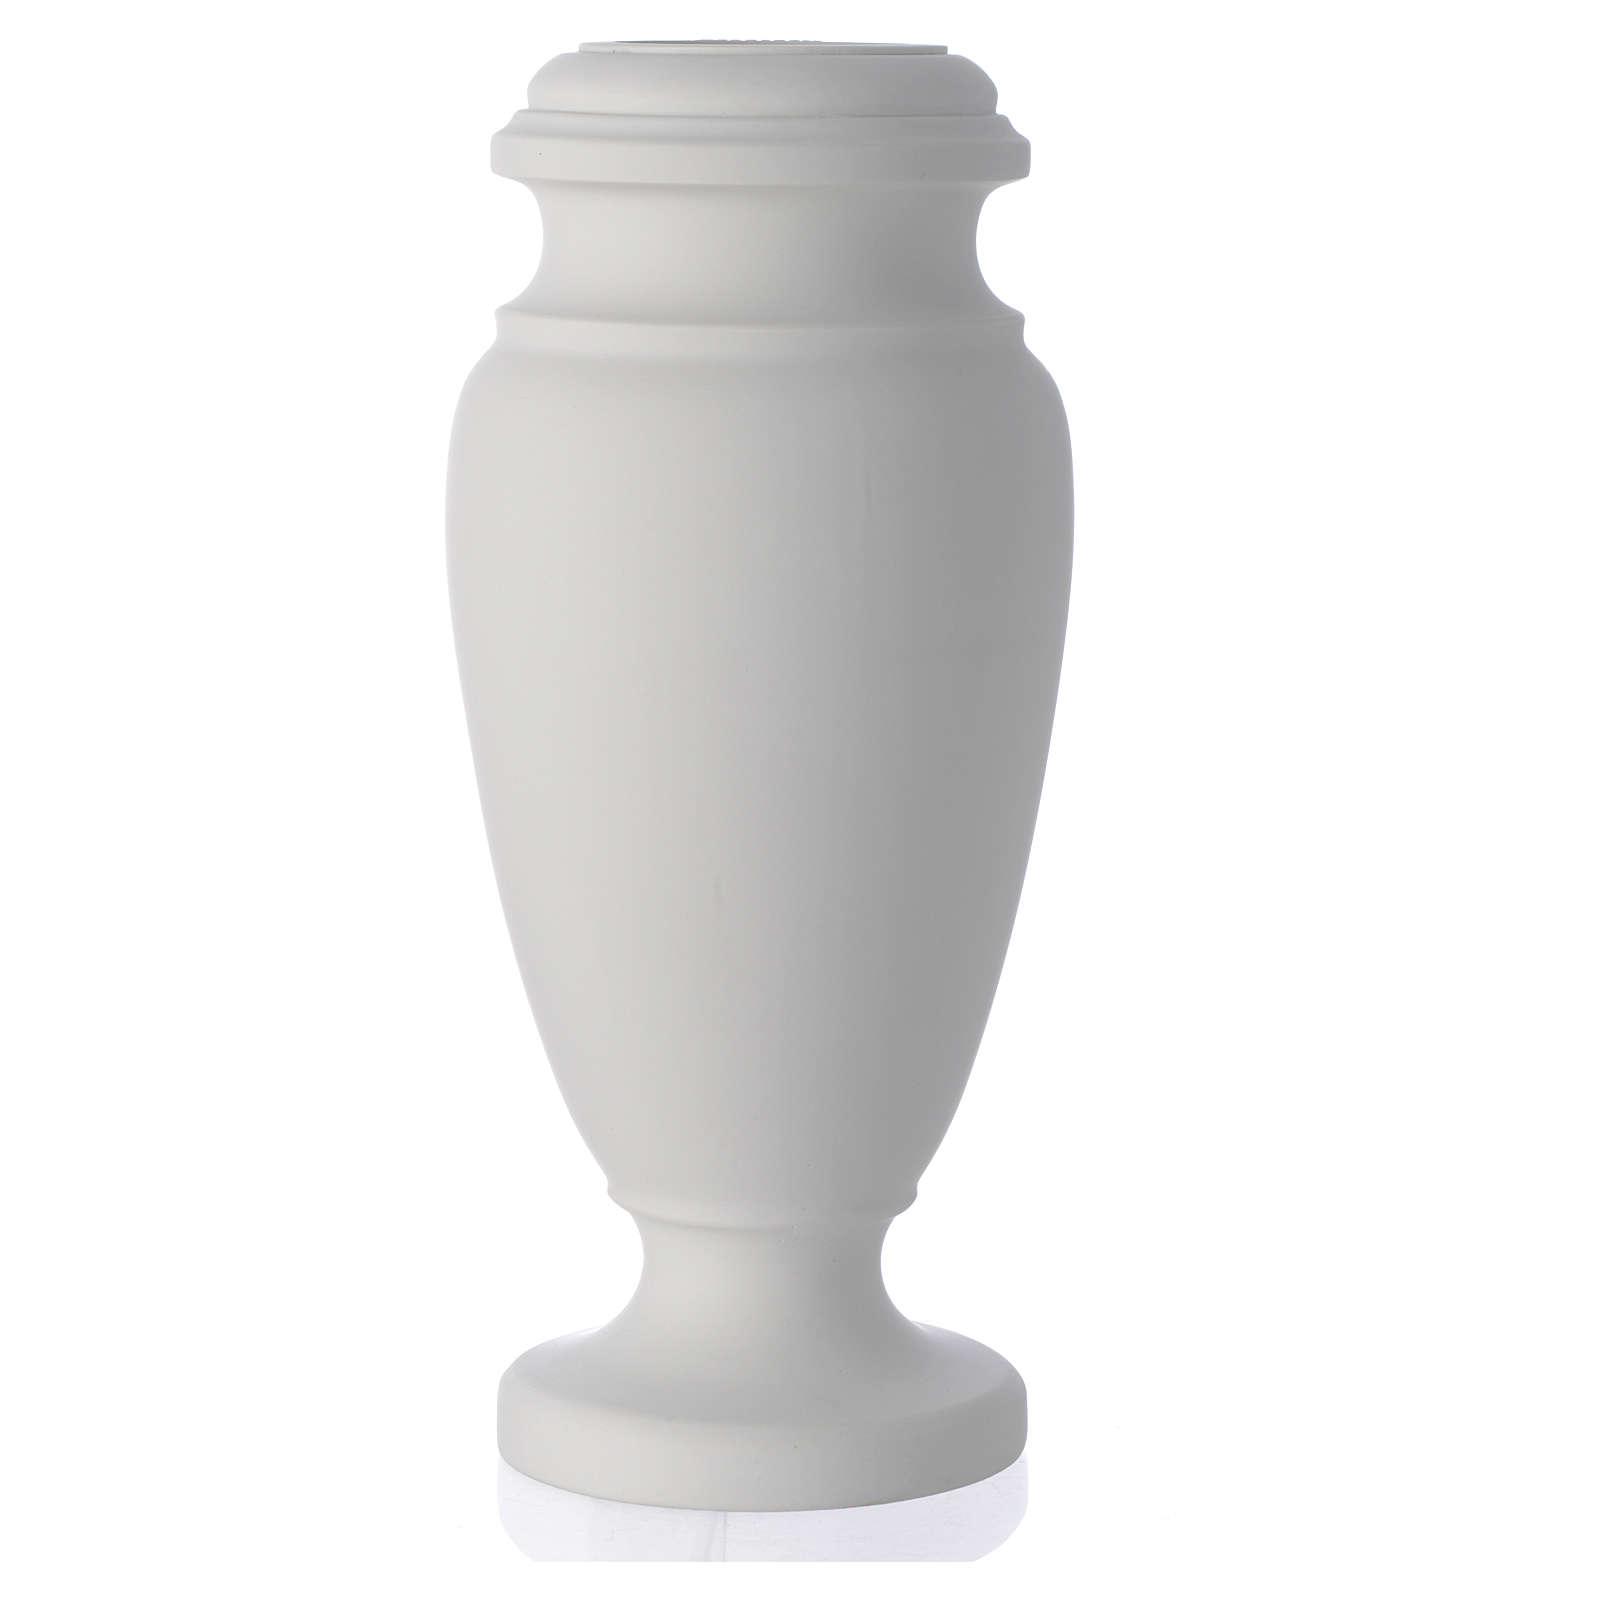 Vaso portafiori per cimitero marmo sintetico 3